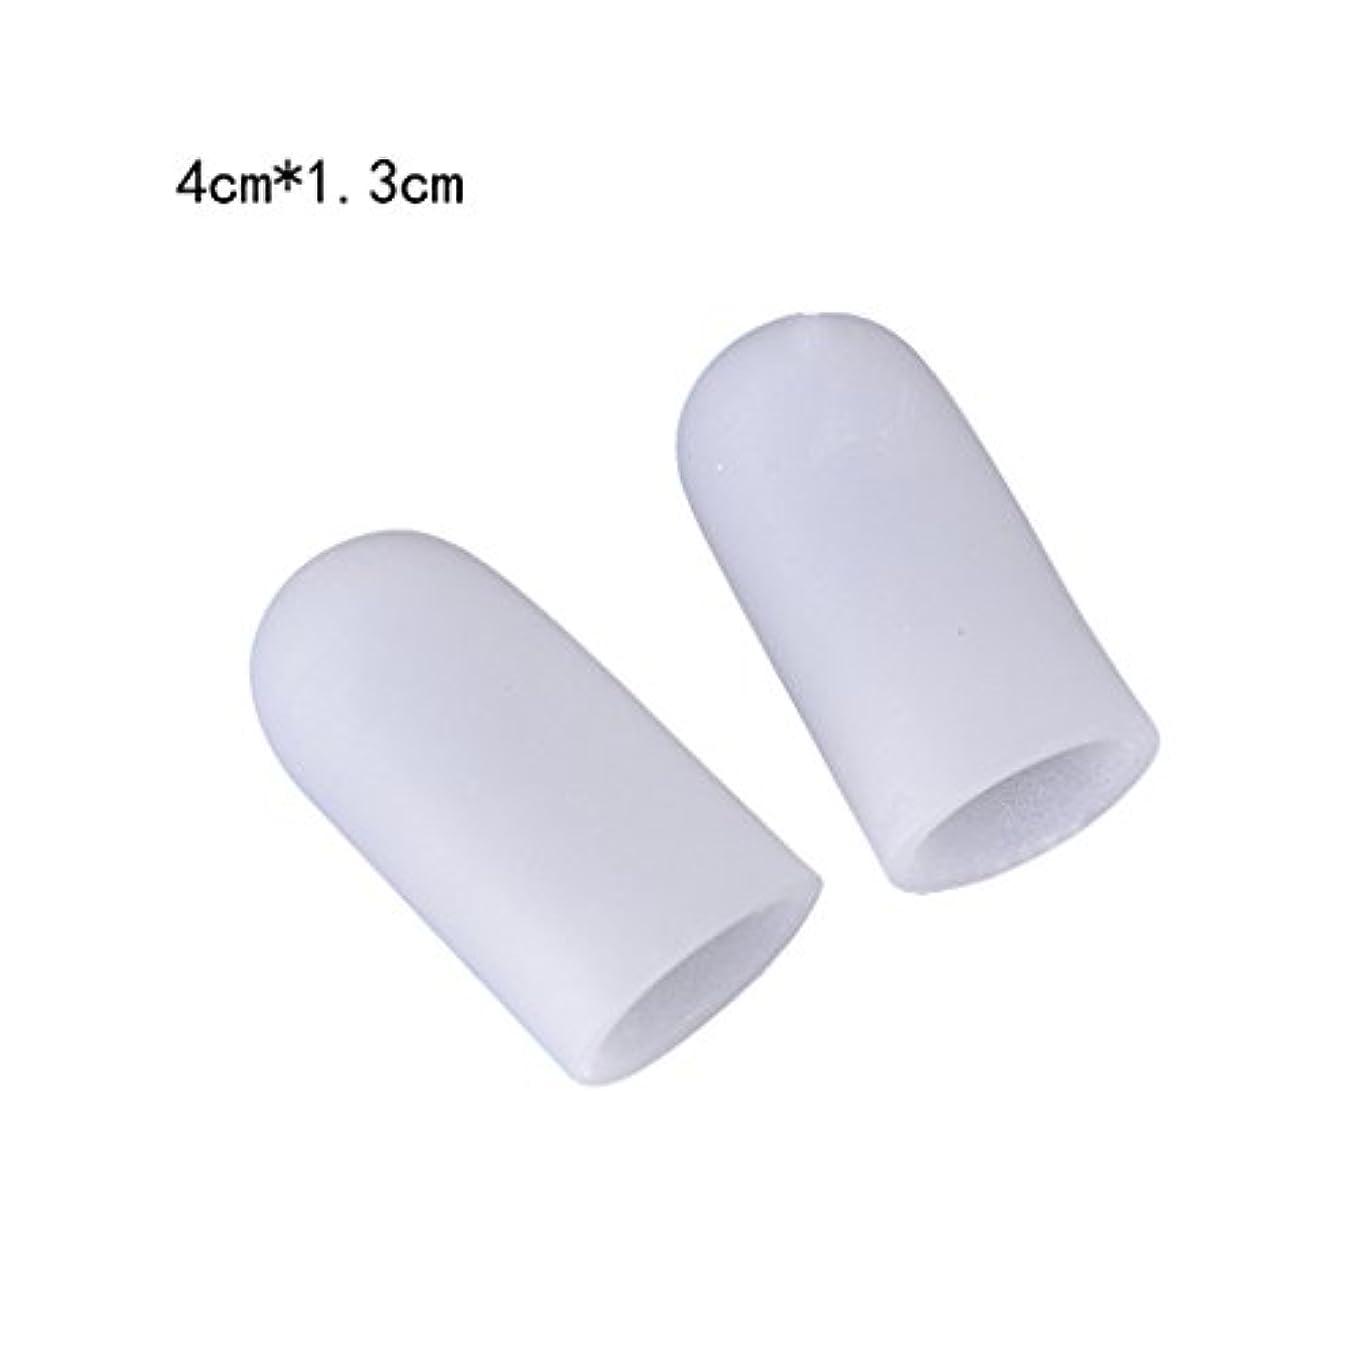 YOKEL 足指保護キャップ つま先プロテクター 足先のつめ保護キャップ シリコン (S)